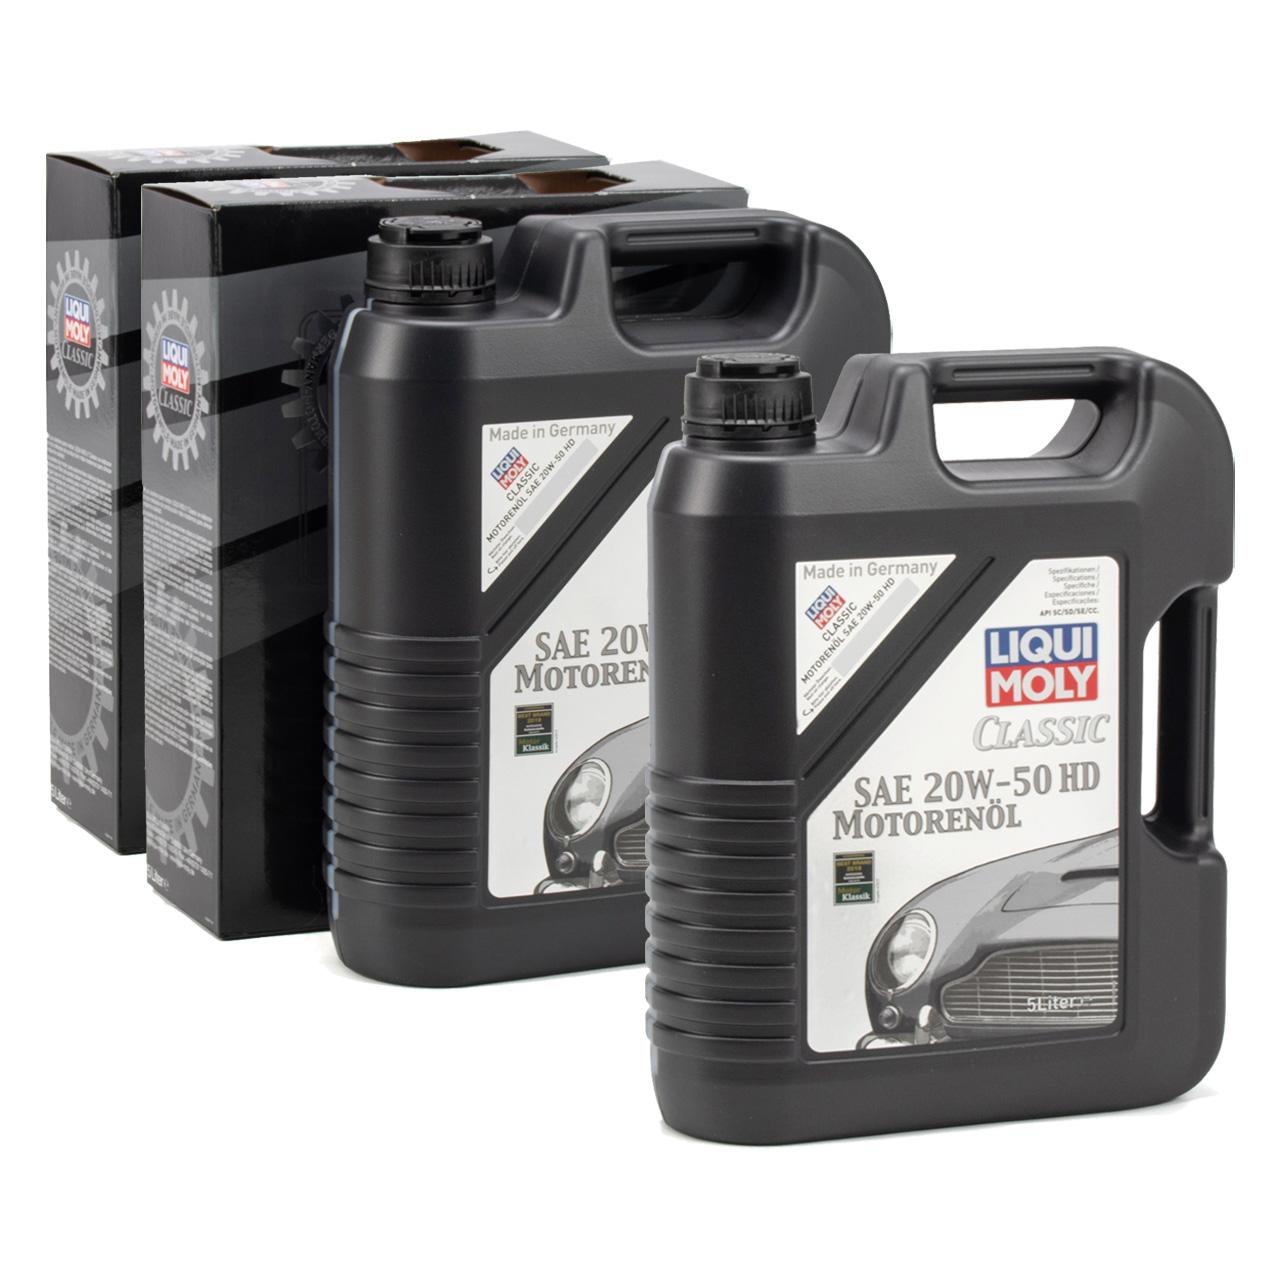 LIQUI MOLY Motoröl Öl CLASSIC 20W-50 20W50 HD Oldtimer Youngtimer - 10L 10 Liter